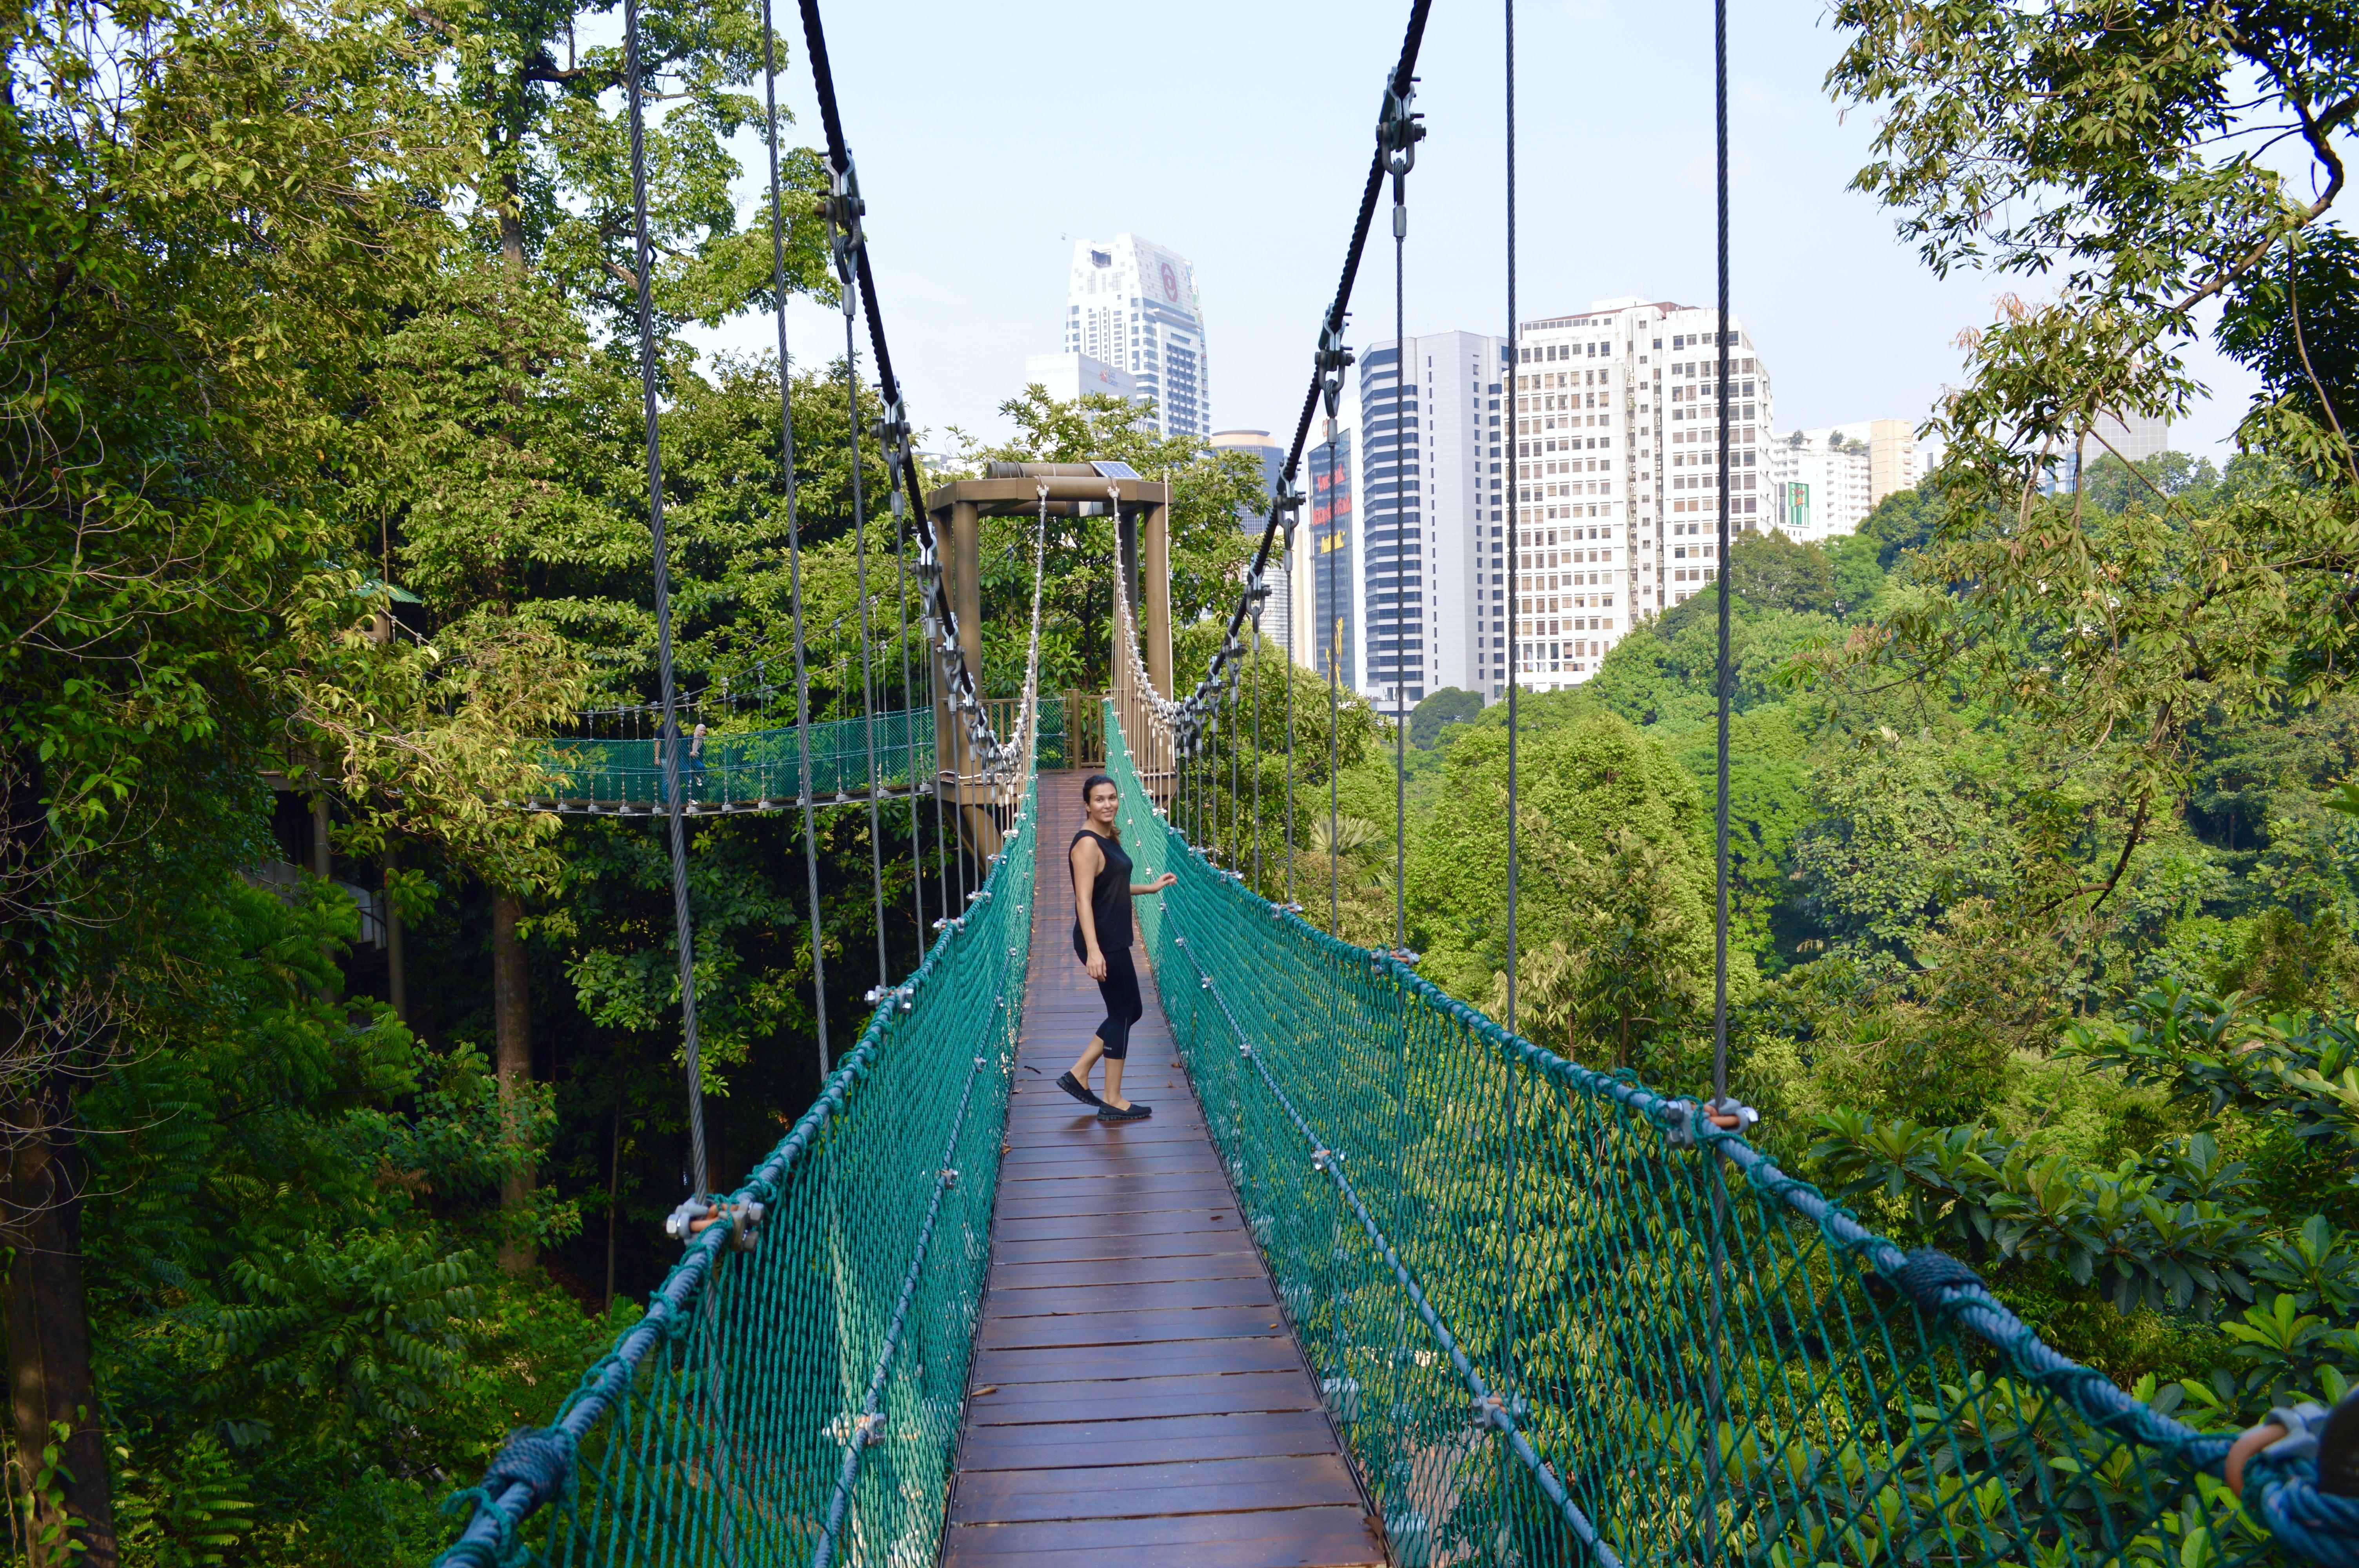 Skywalk Kuala Lumpur | Stay Healthy while traveling | Hello Raya Blog